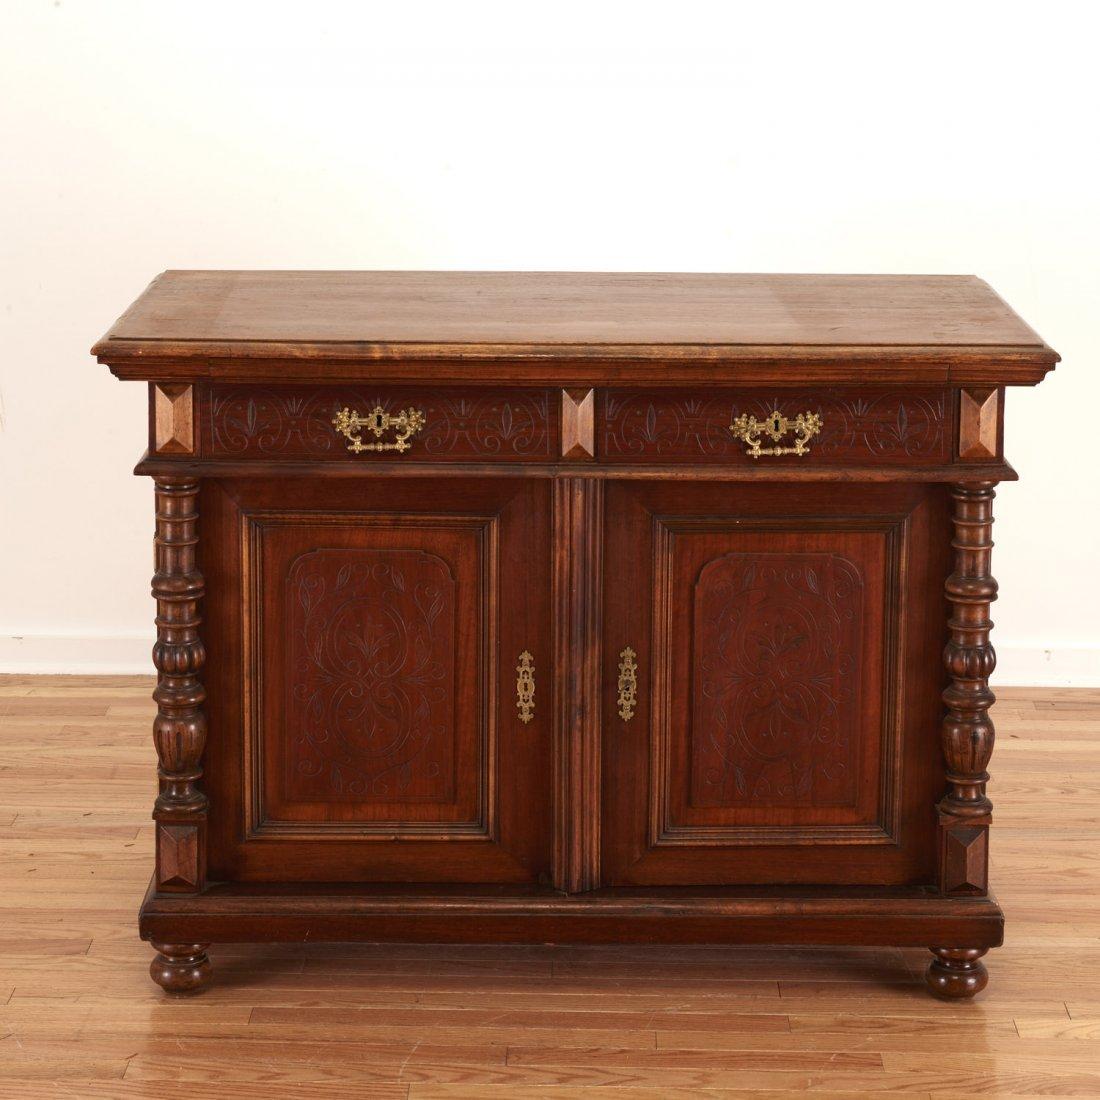 German Jacobean style mahogany bookcase cabinet - 3